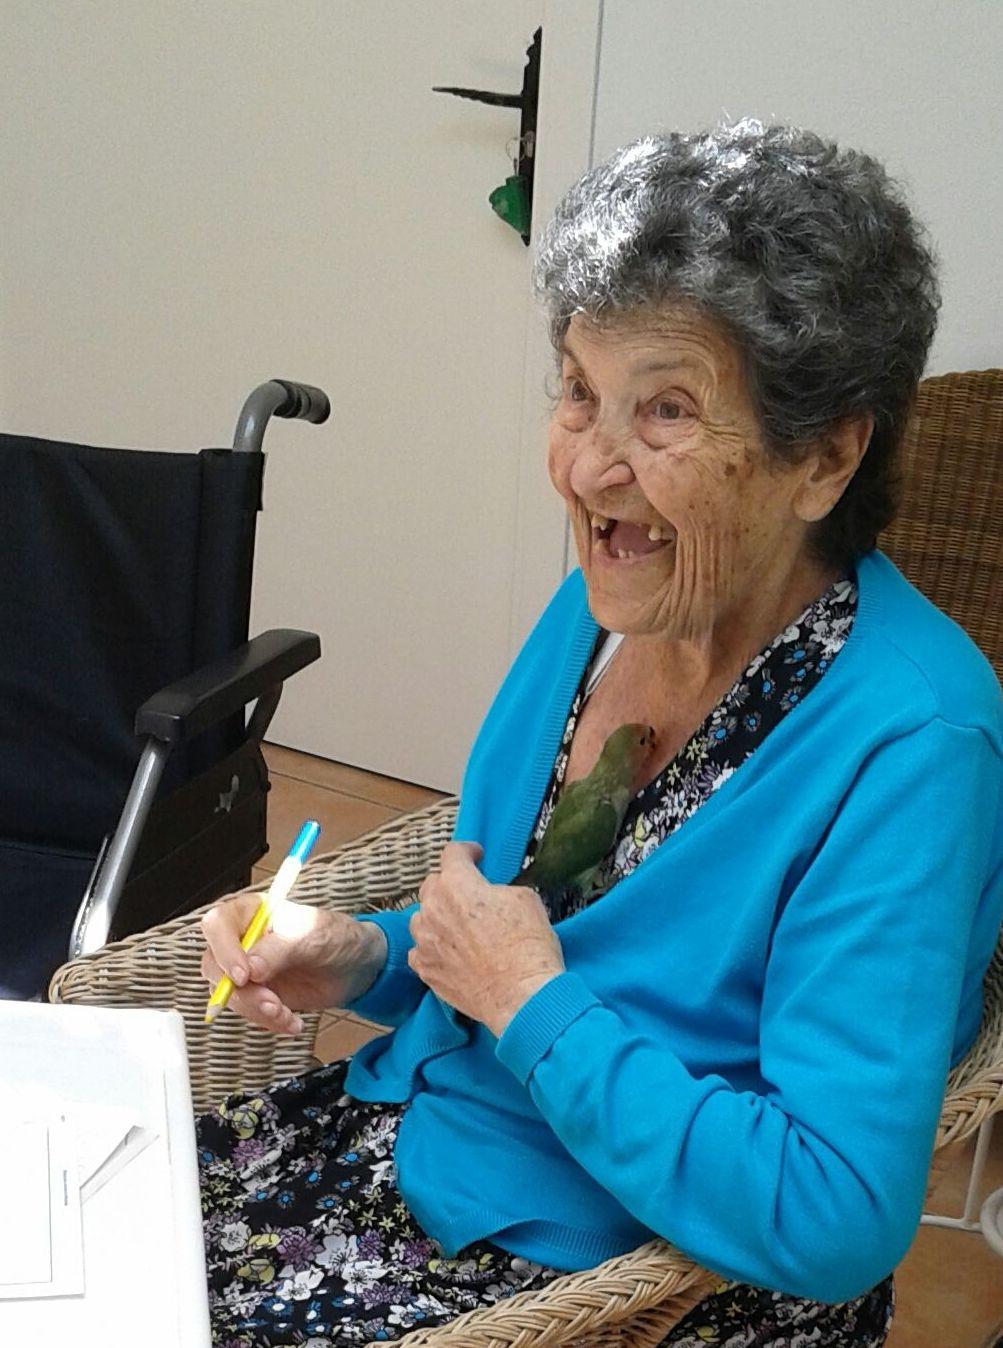 Homenaje a nuestra residente Soledad Mazo Bravo